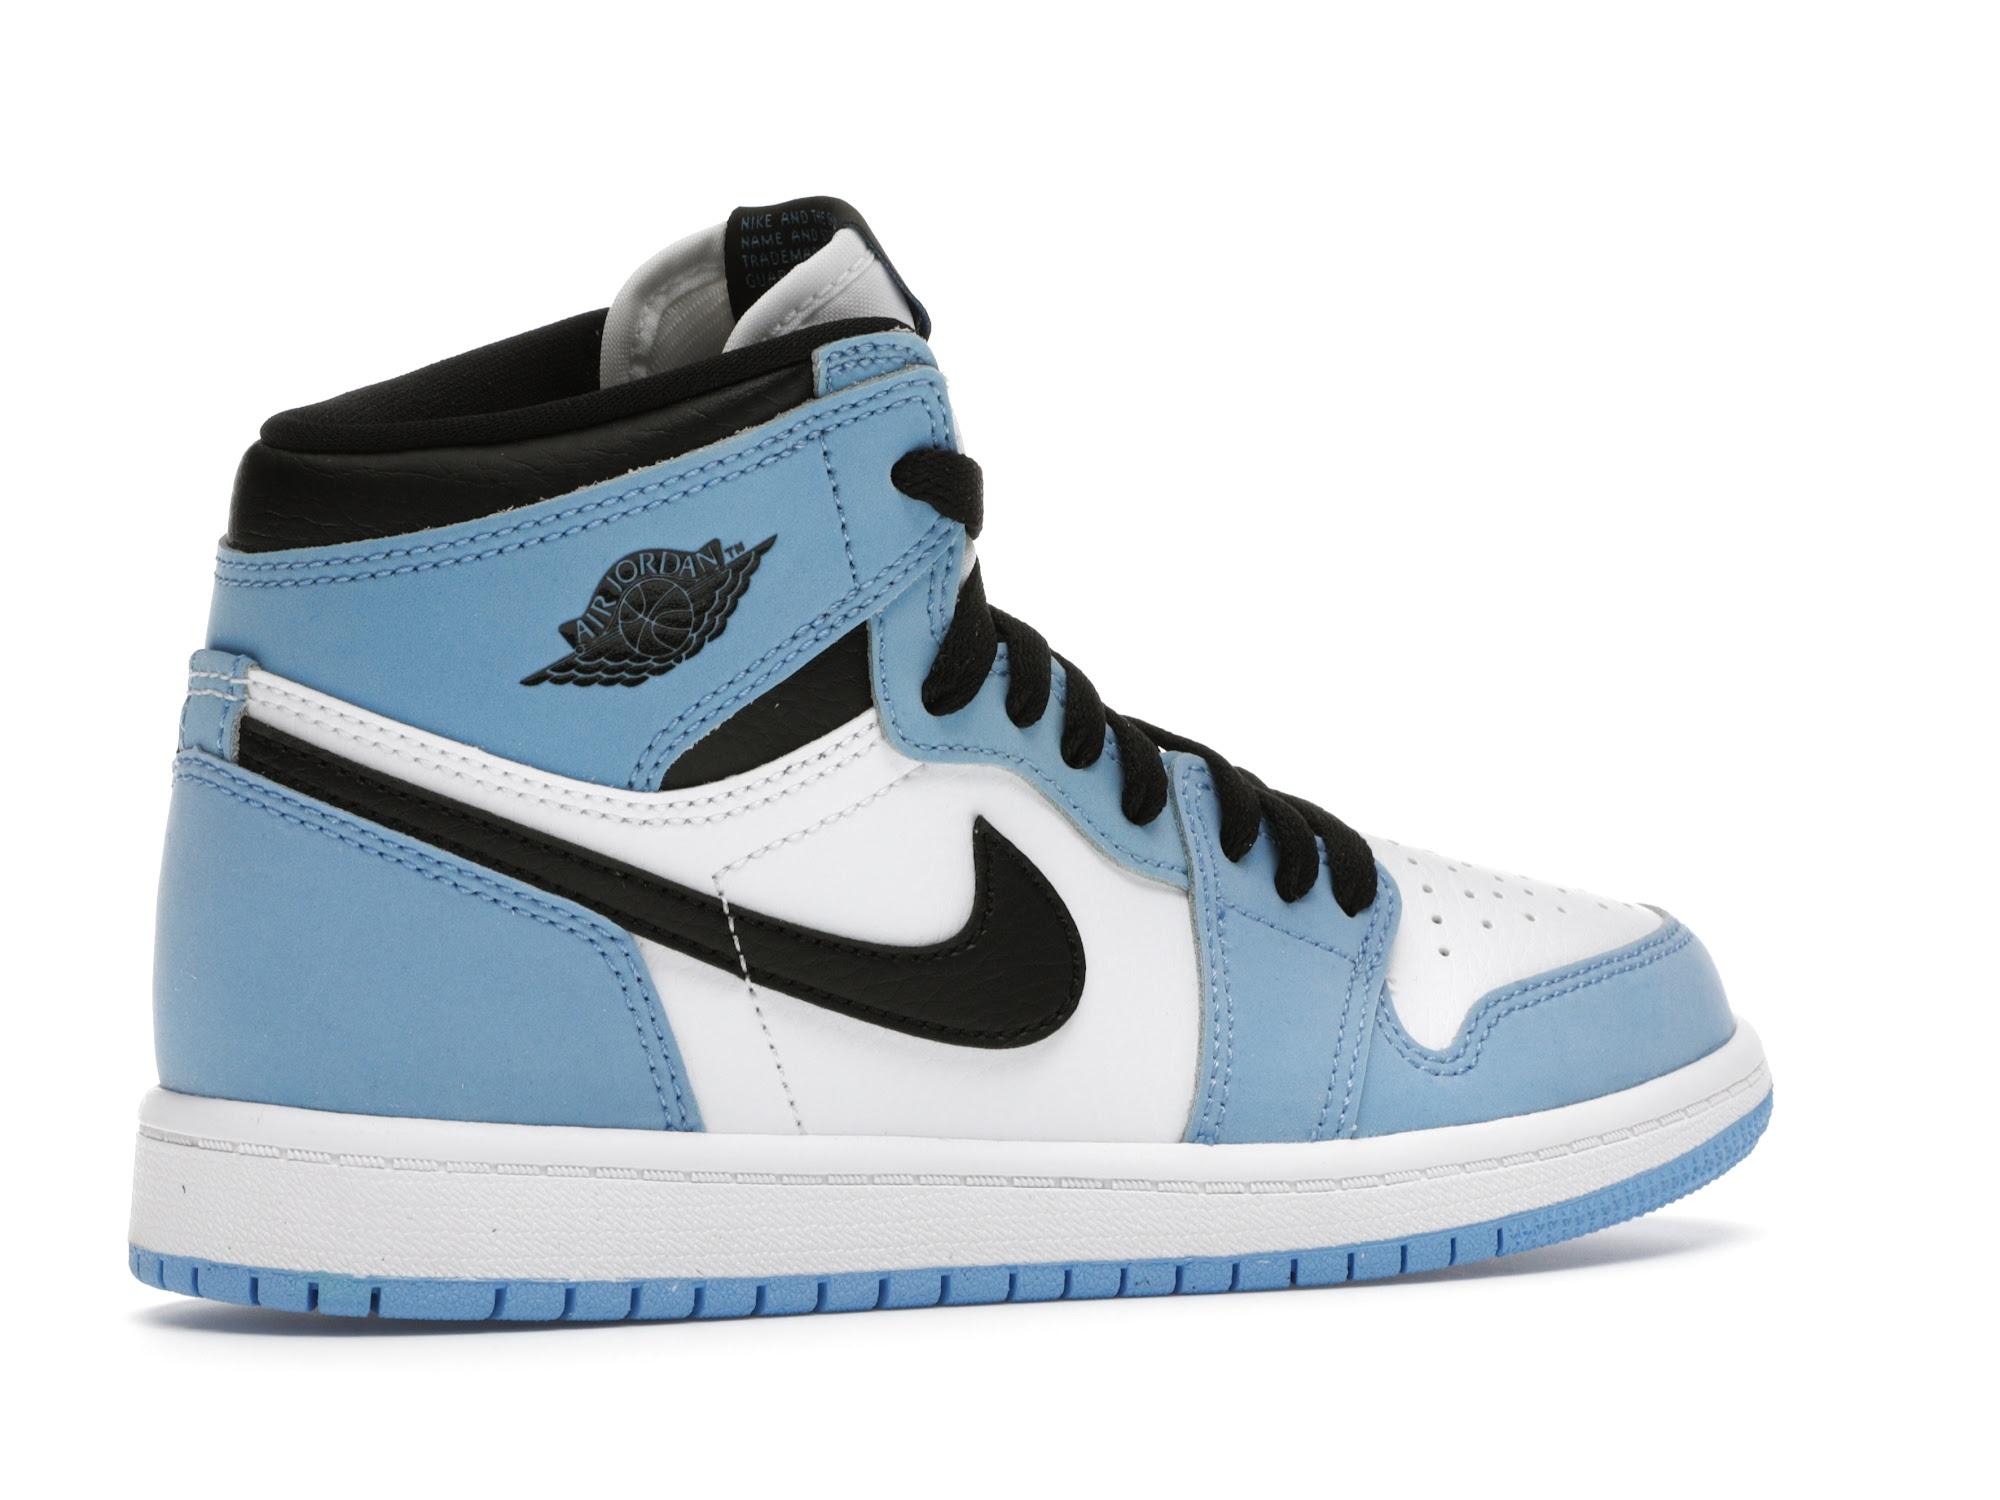 Jordan 1 Retro High OG University Blue (PS) - AQ2664-134